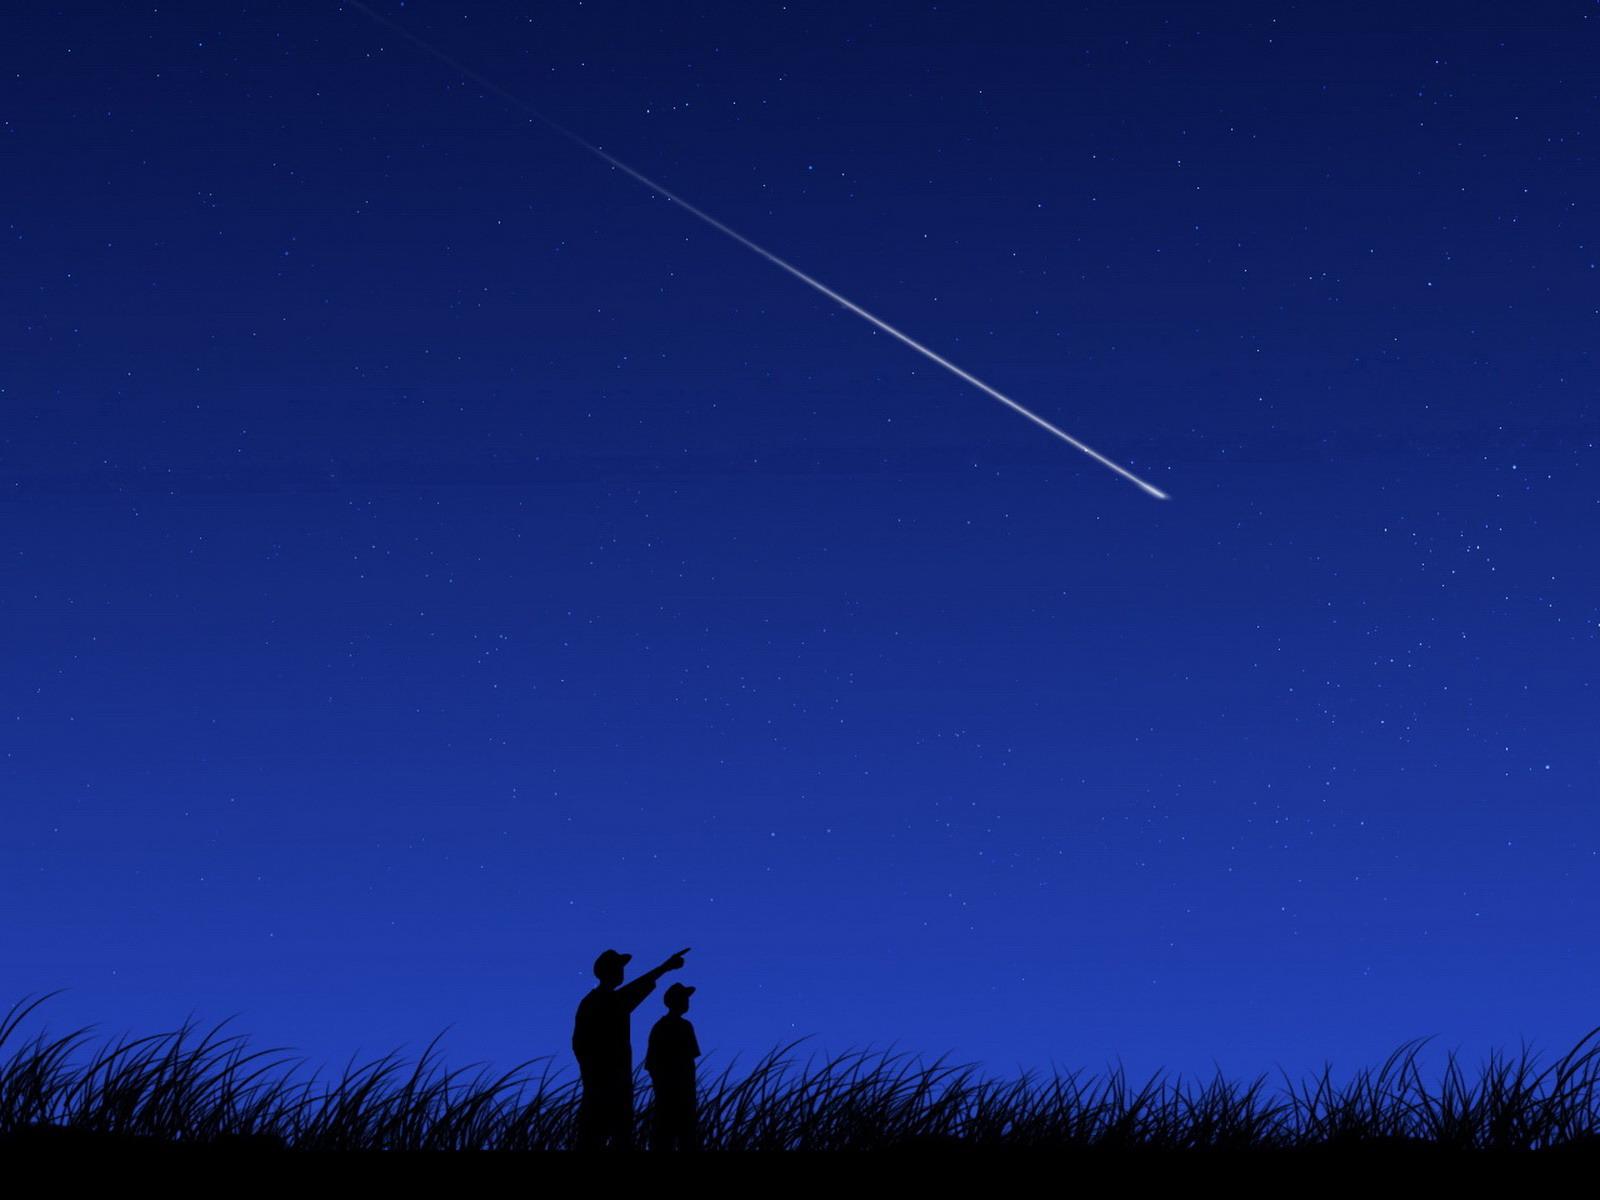 shooting star Wallpapers shooting star Myspace Backgrounds shooting 1600x1200